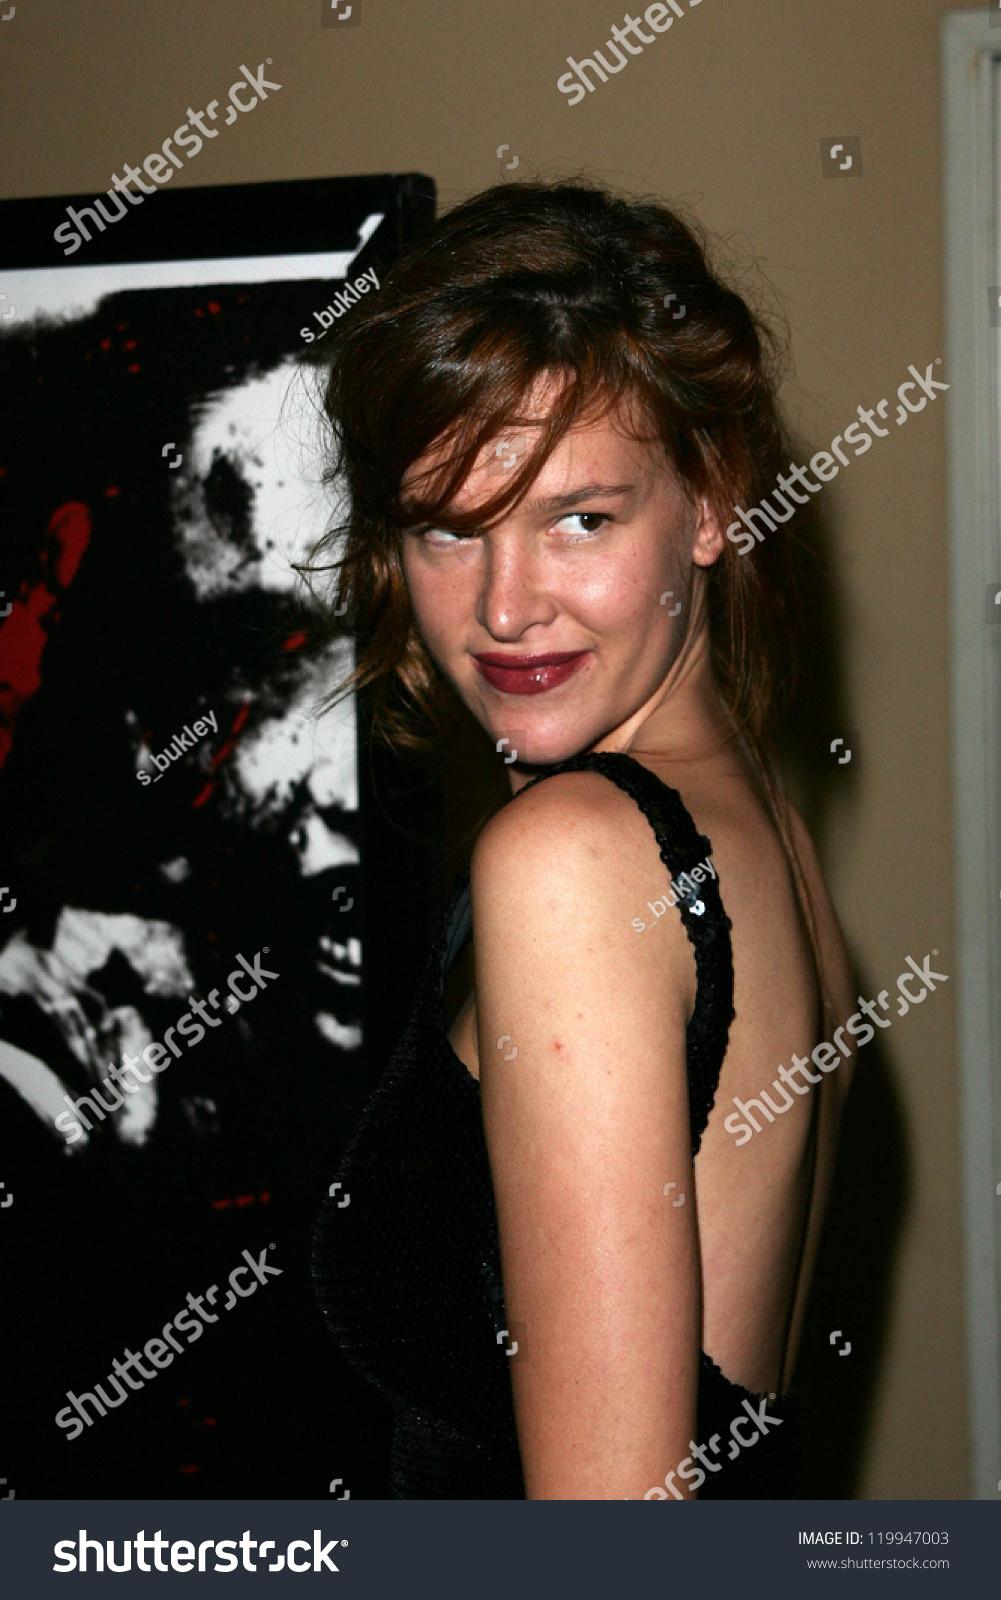 Celebrites Leslie Sauvage nude photos 2019